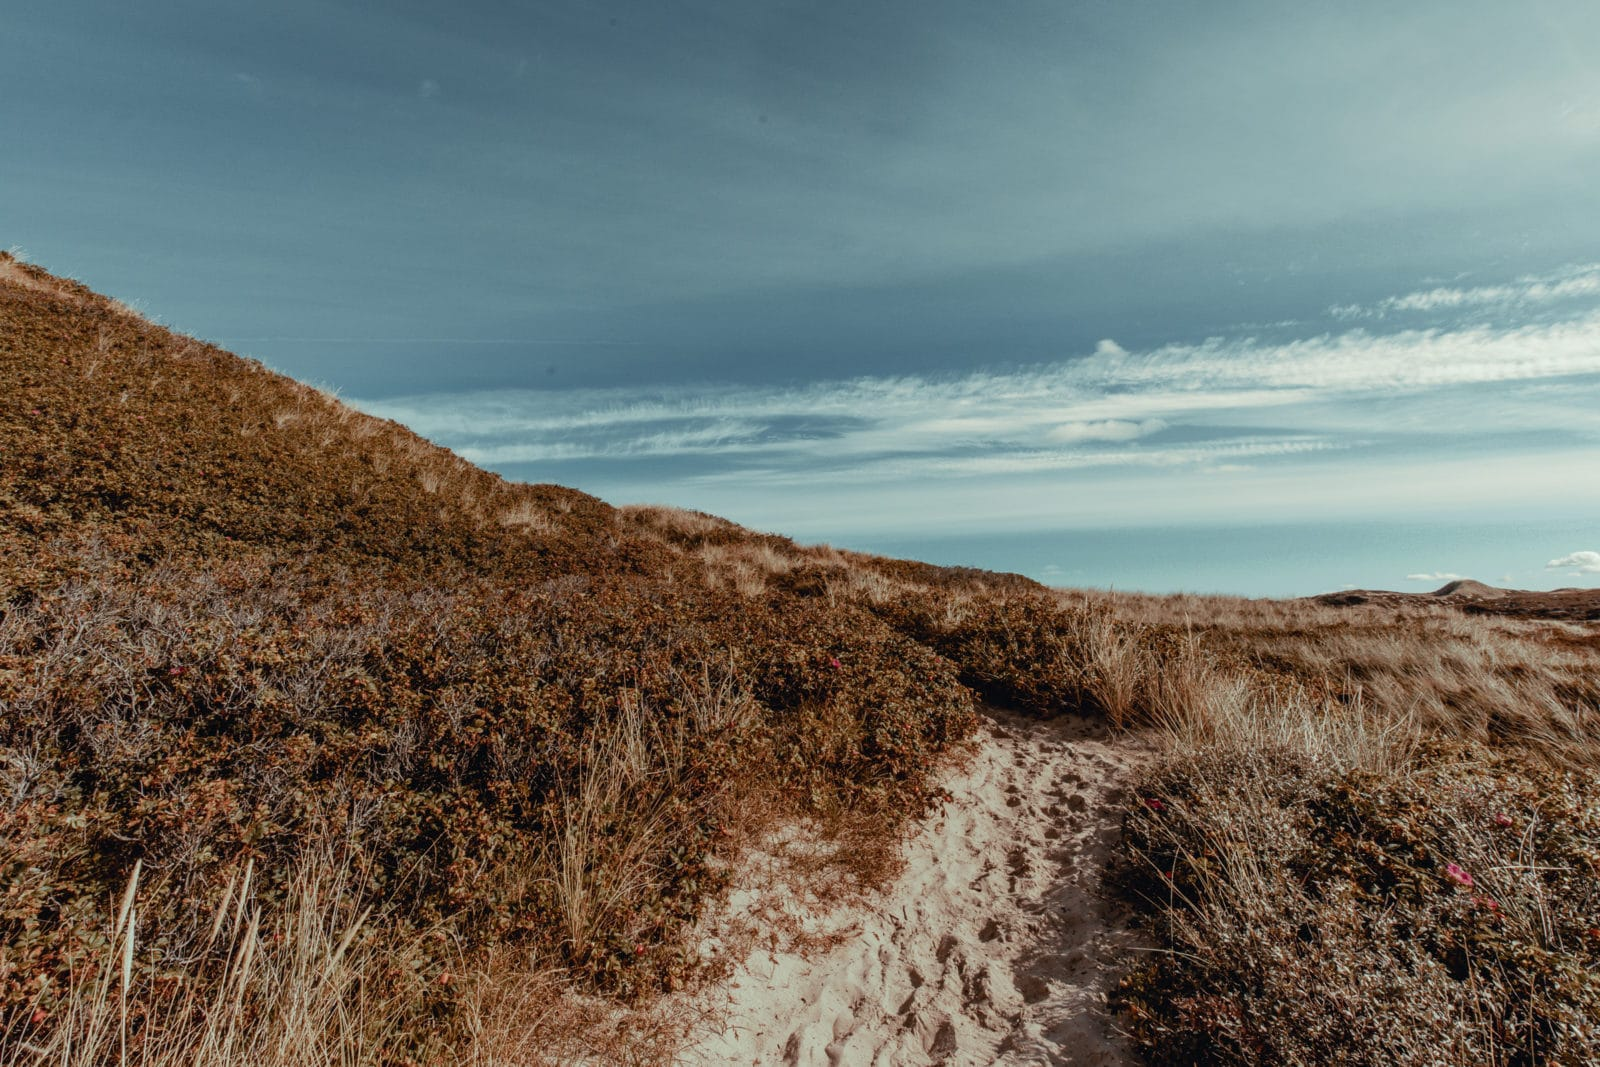 Sylt: Bildungsurlaub mit Yoga, Strand & Meer 29